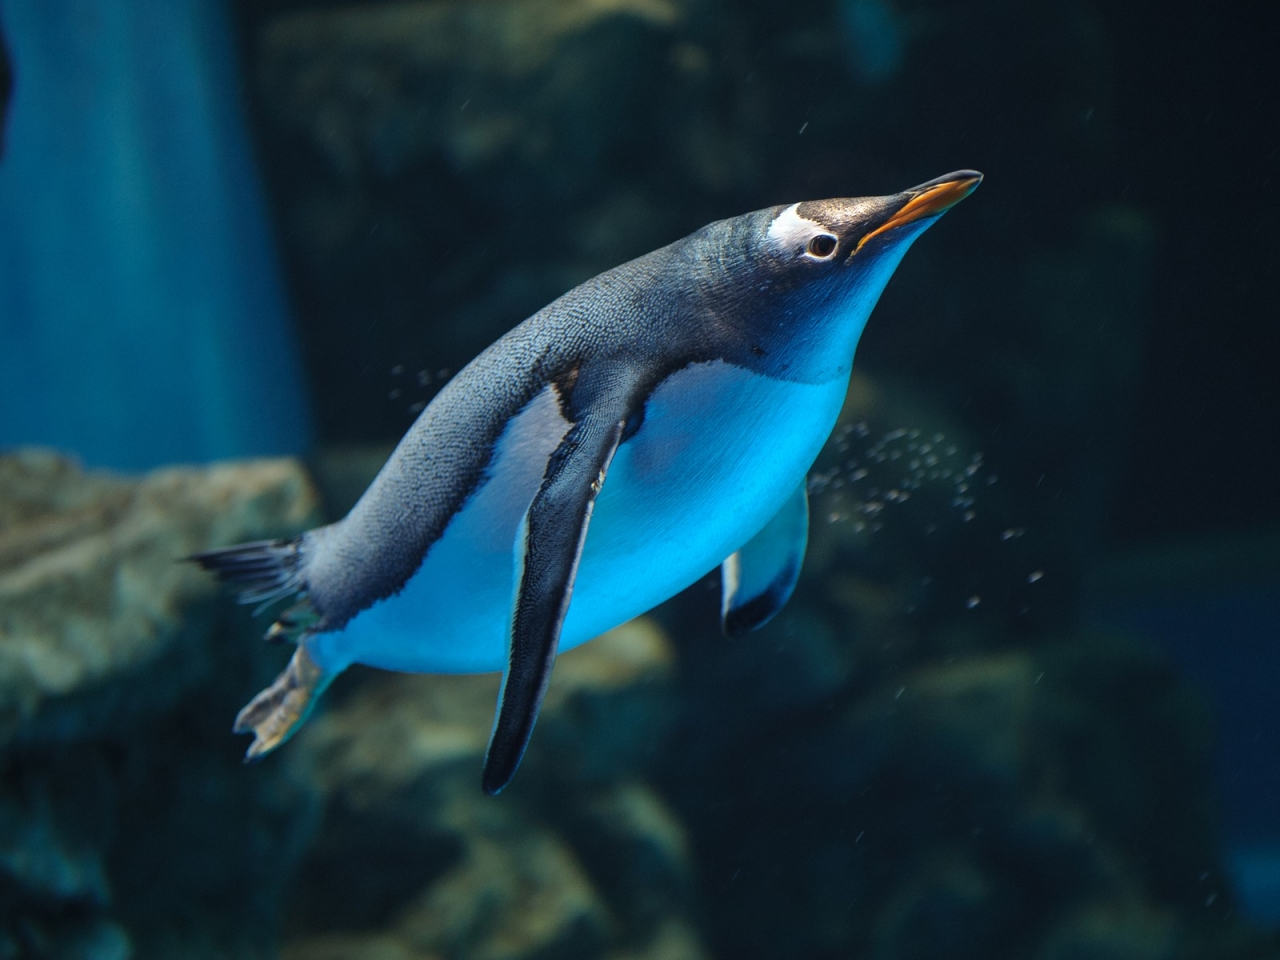 Un pinguino buceando - 1280x960